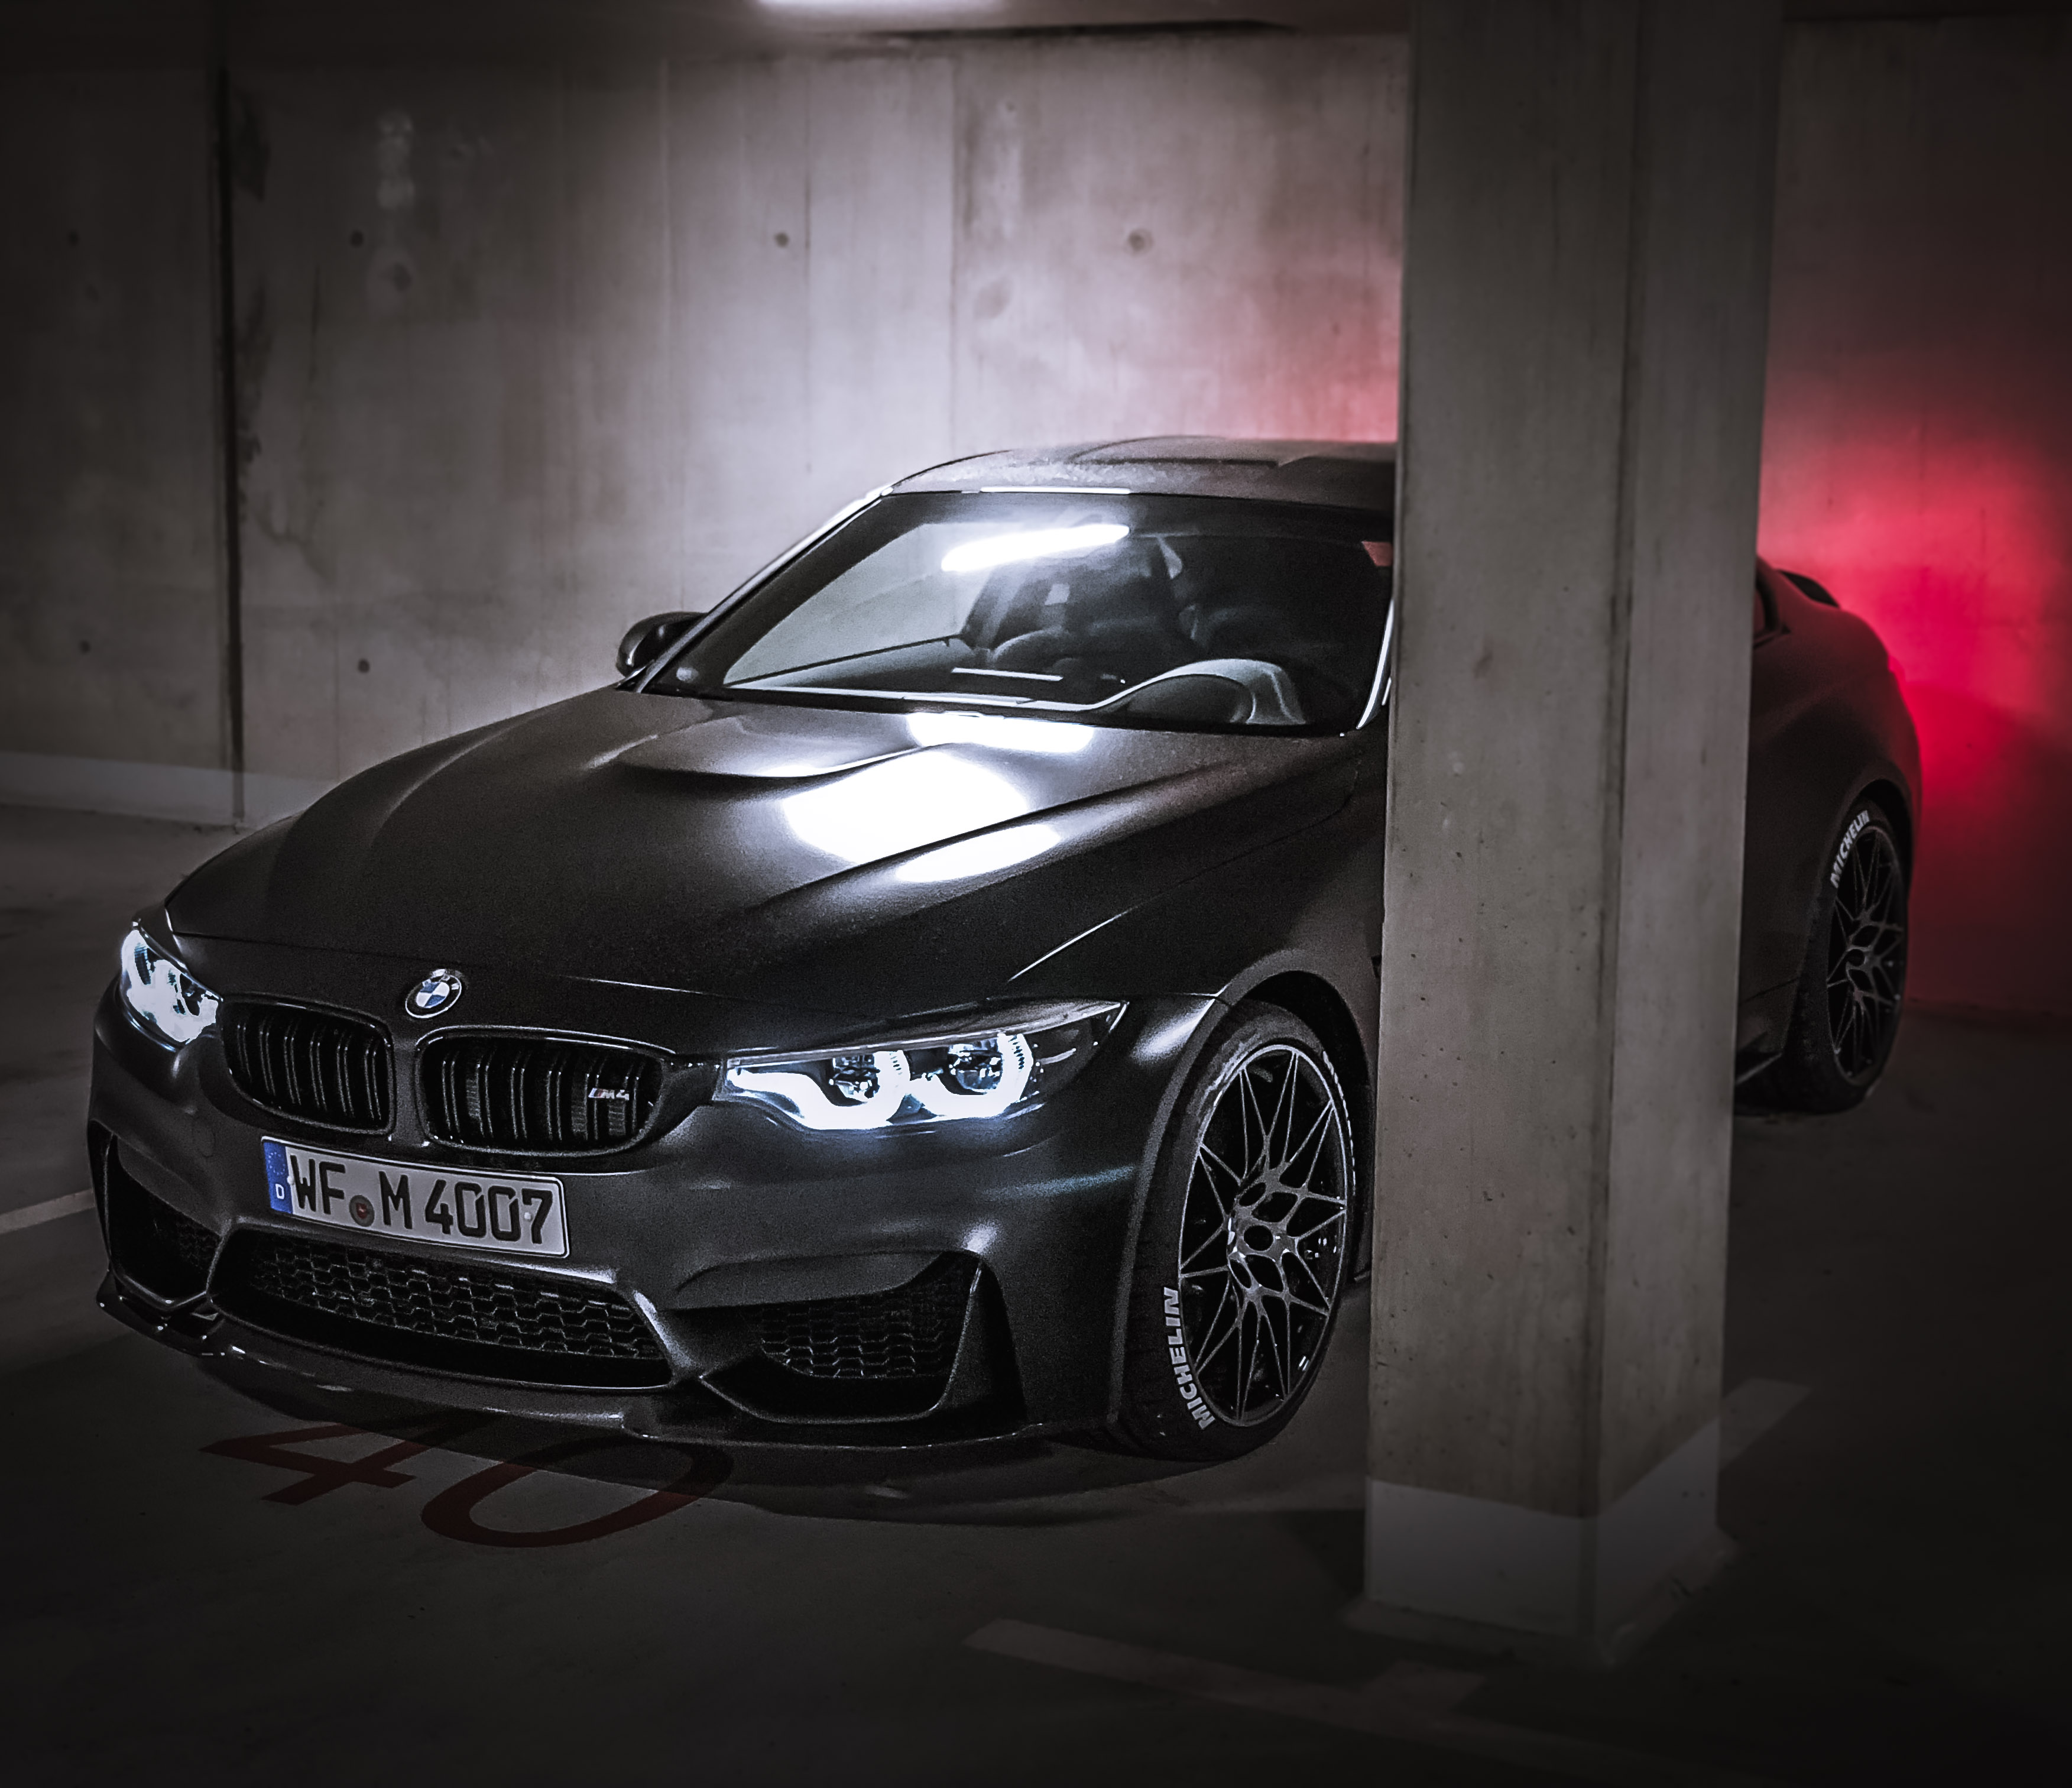 Bmw M4 Sport: Sound Check & Acceleration